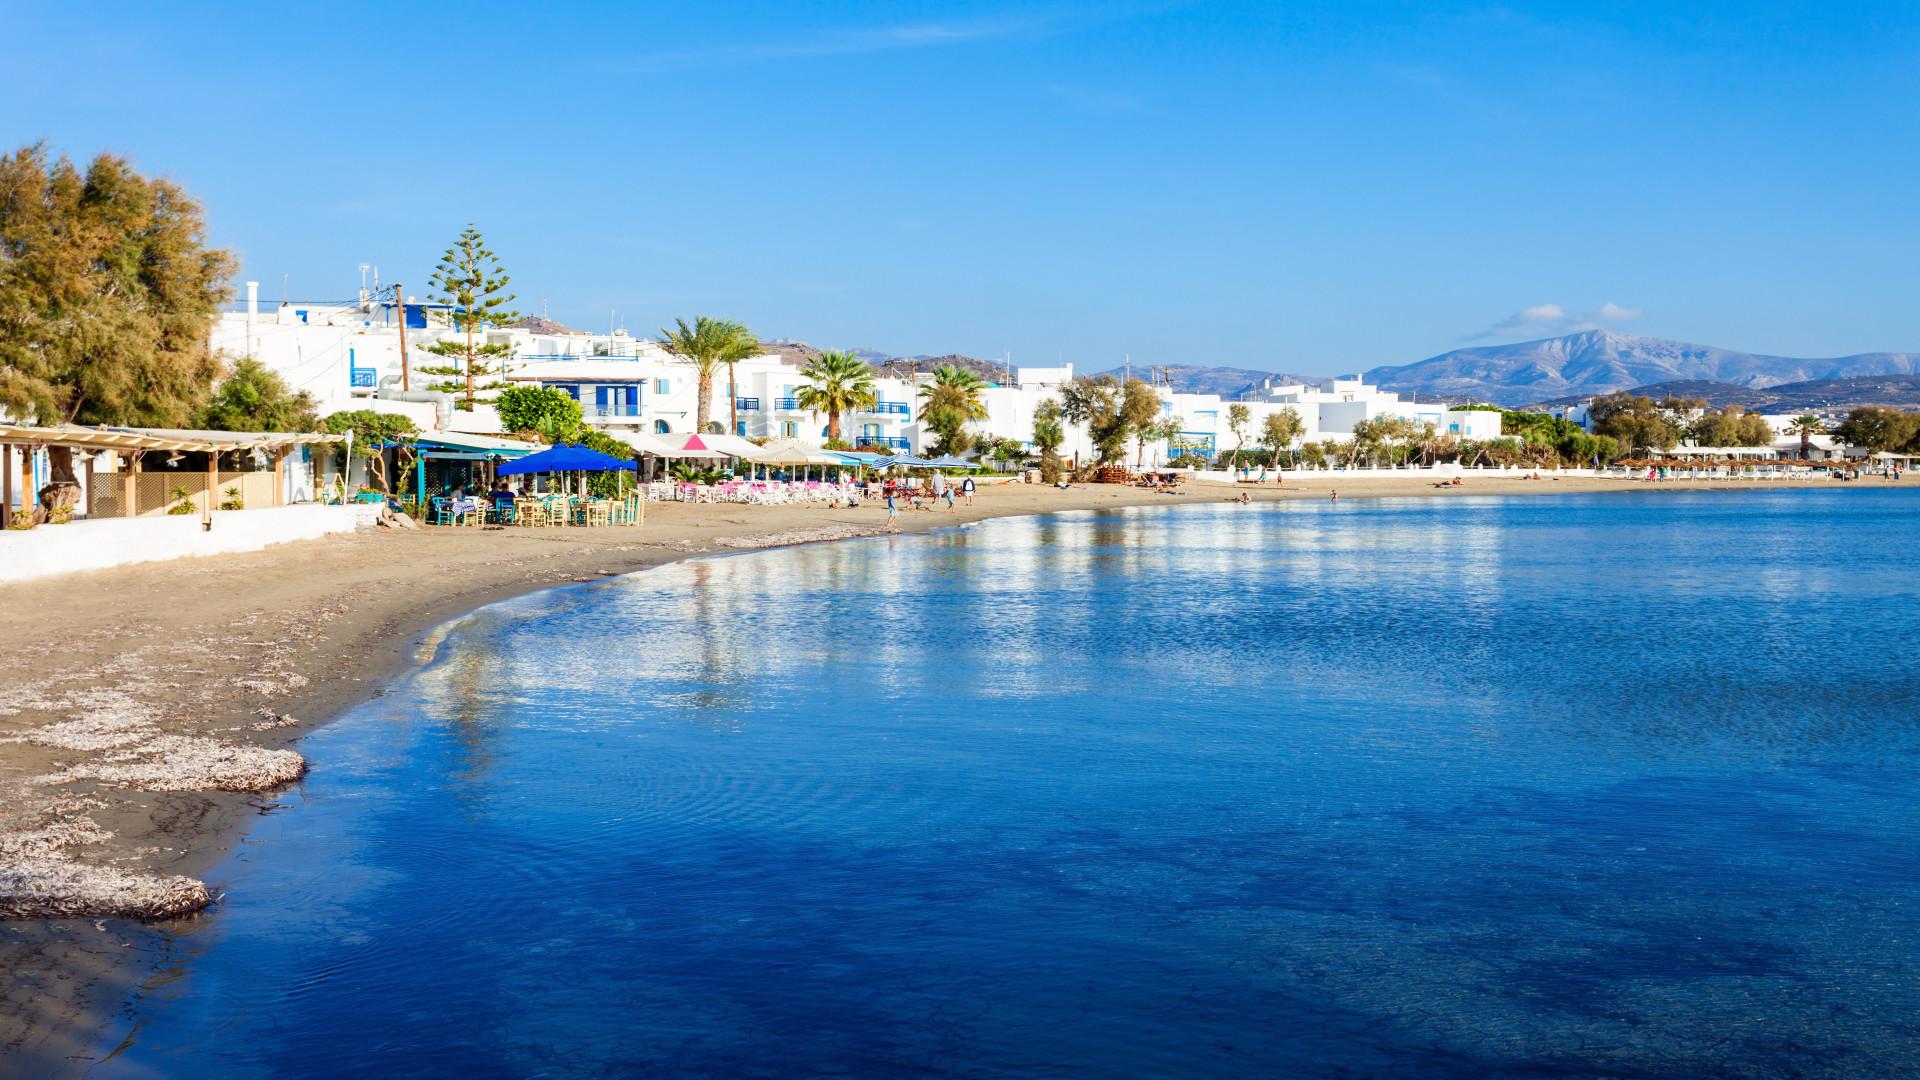 Agios Georgios Beach, Naxos, Griekenland, blauw water, strand, witte gebouwen